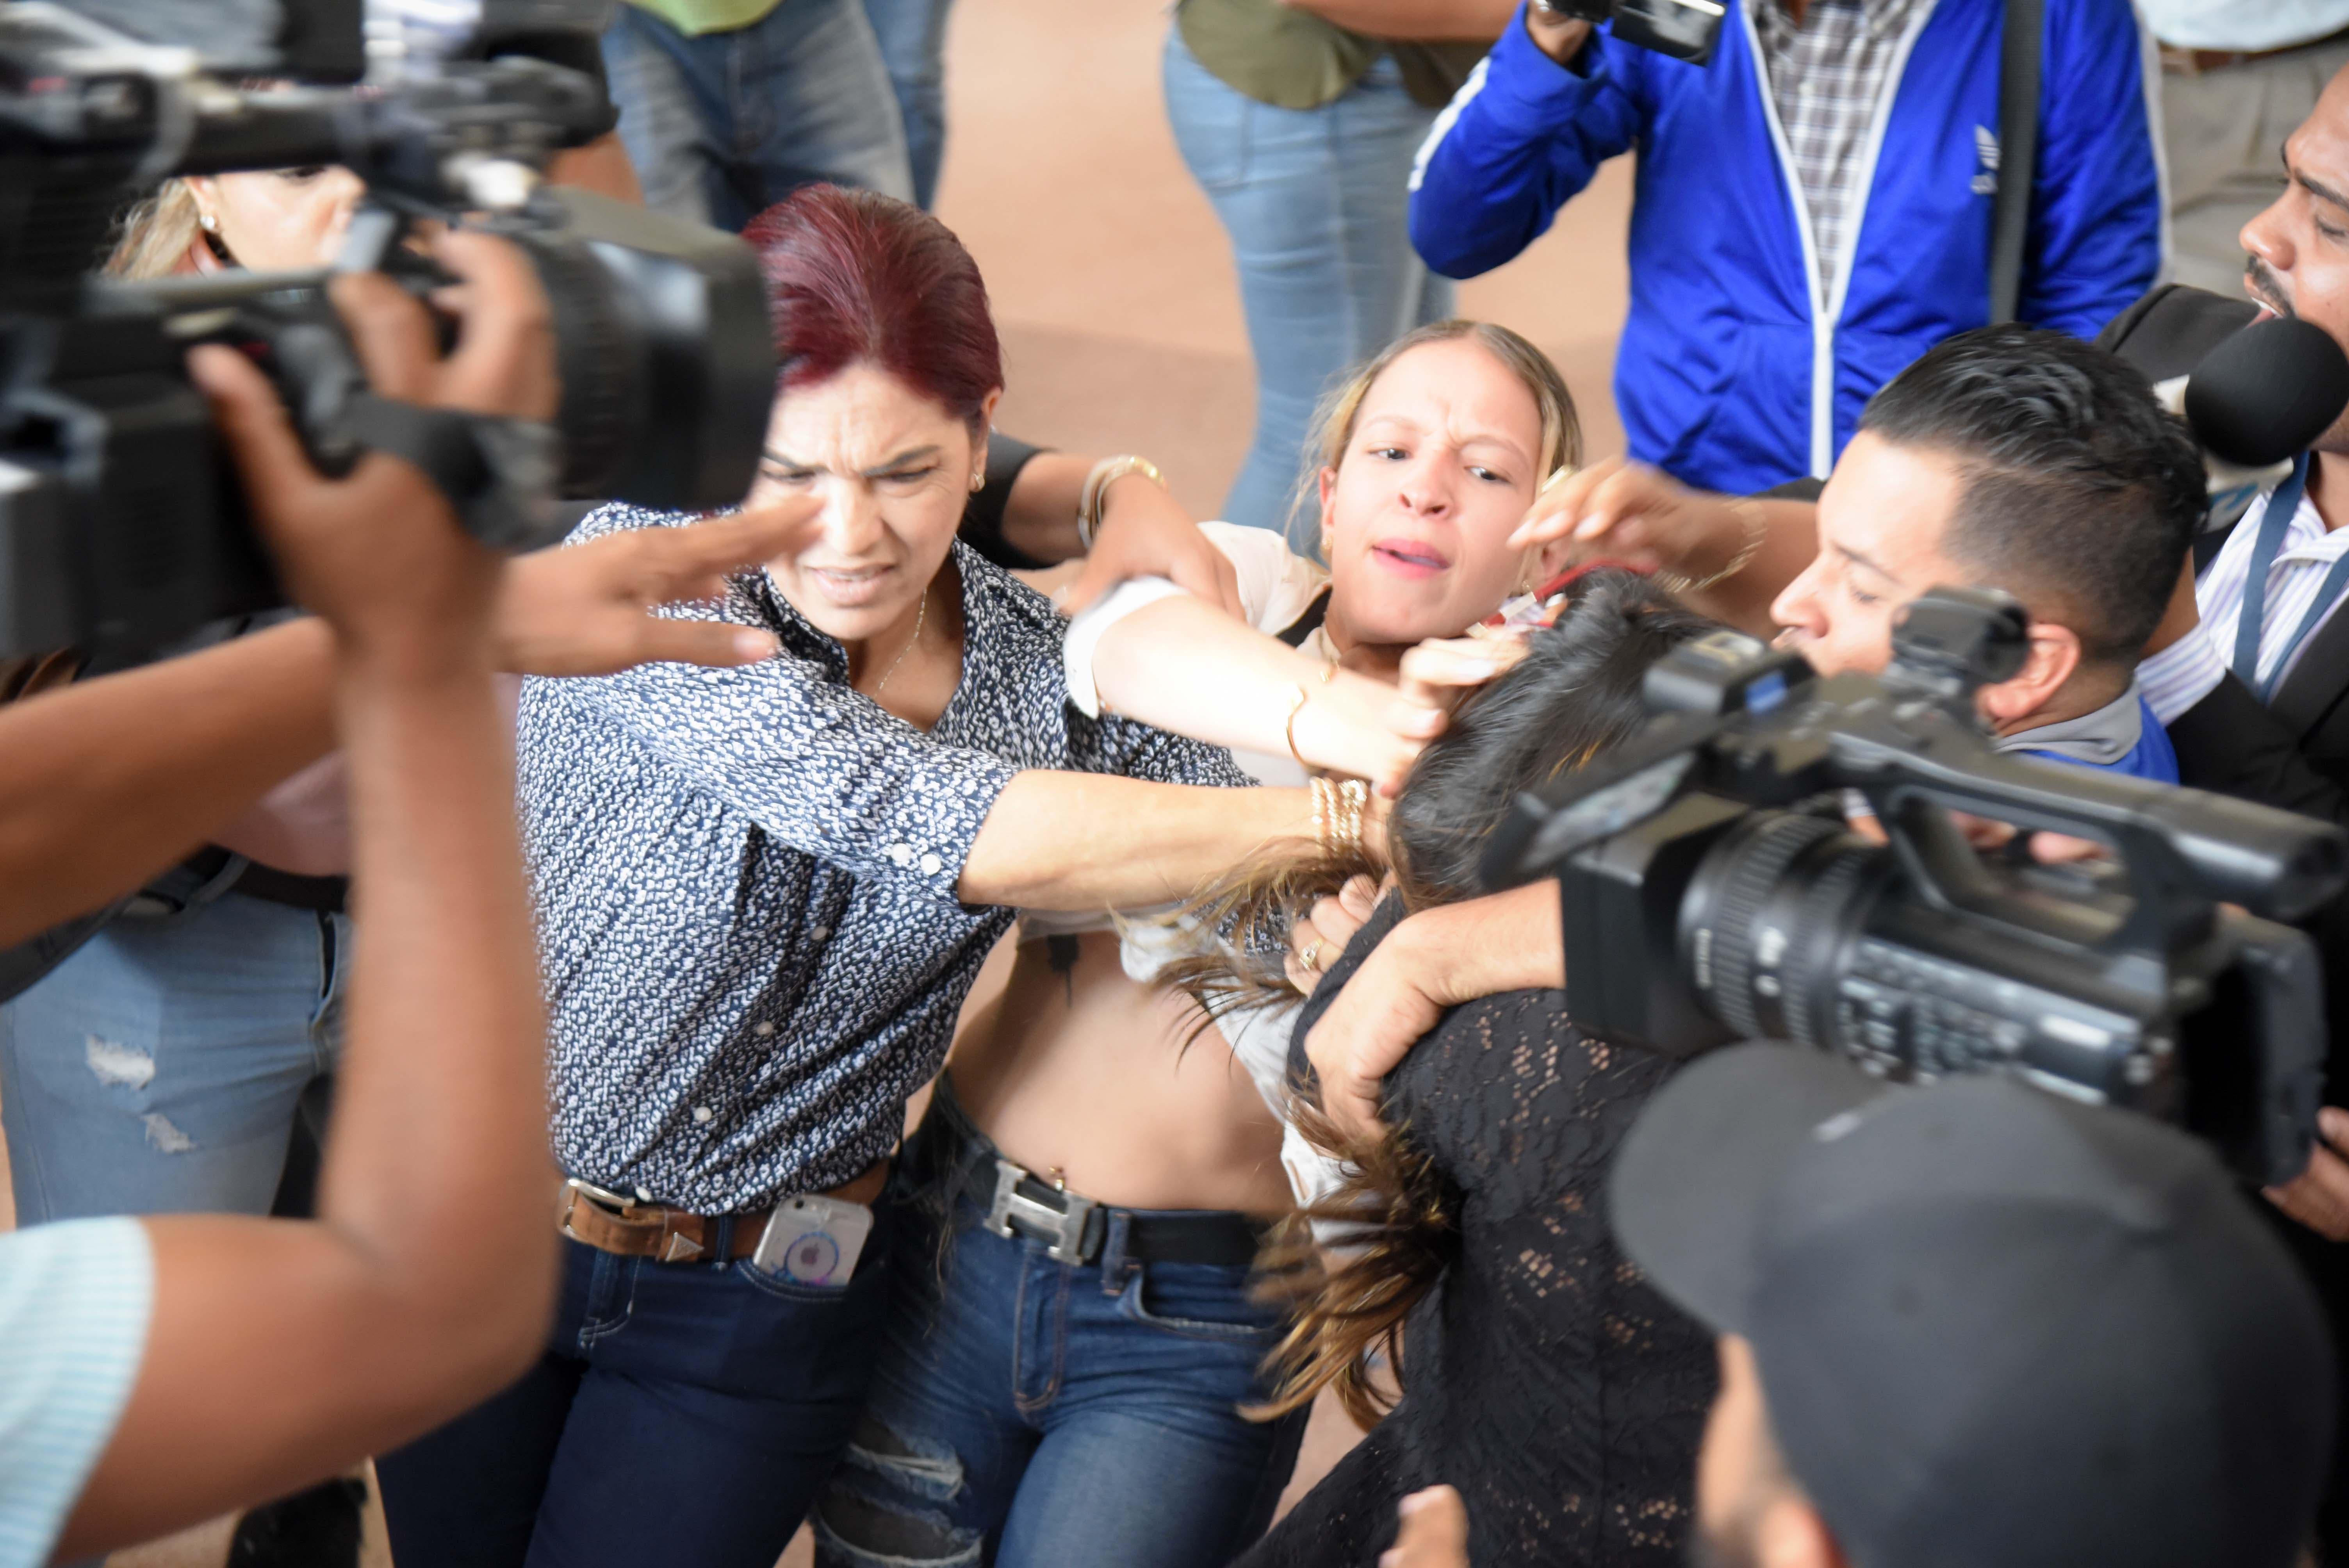 Periodista agredida por imputado en Santiago será sometida a terapia por lesión cervical